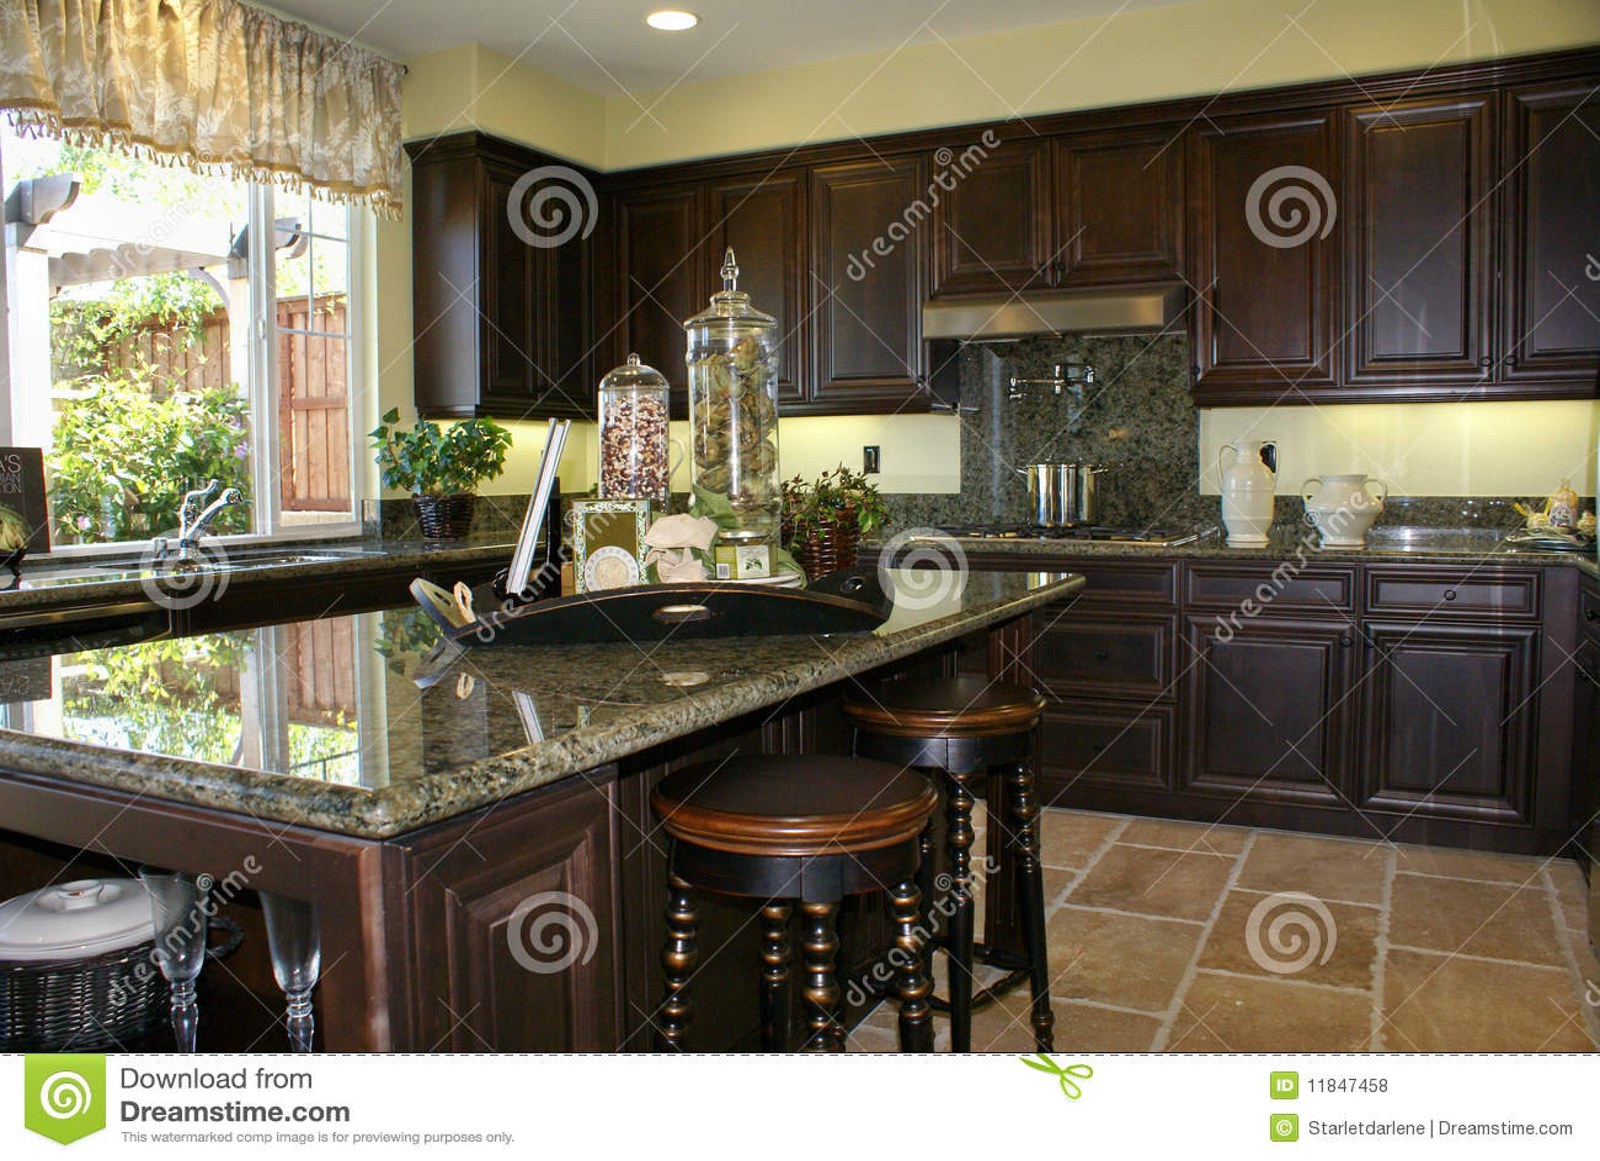 belle cuisine photo stock image du modules home lumi res 11847458. Black Bedroom Furniture Sets. Home Design Ideas